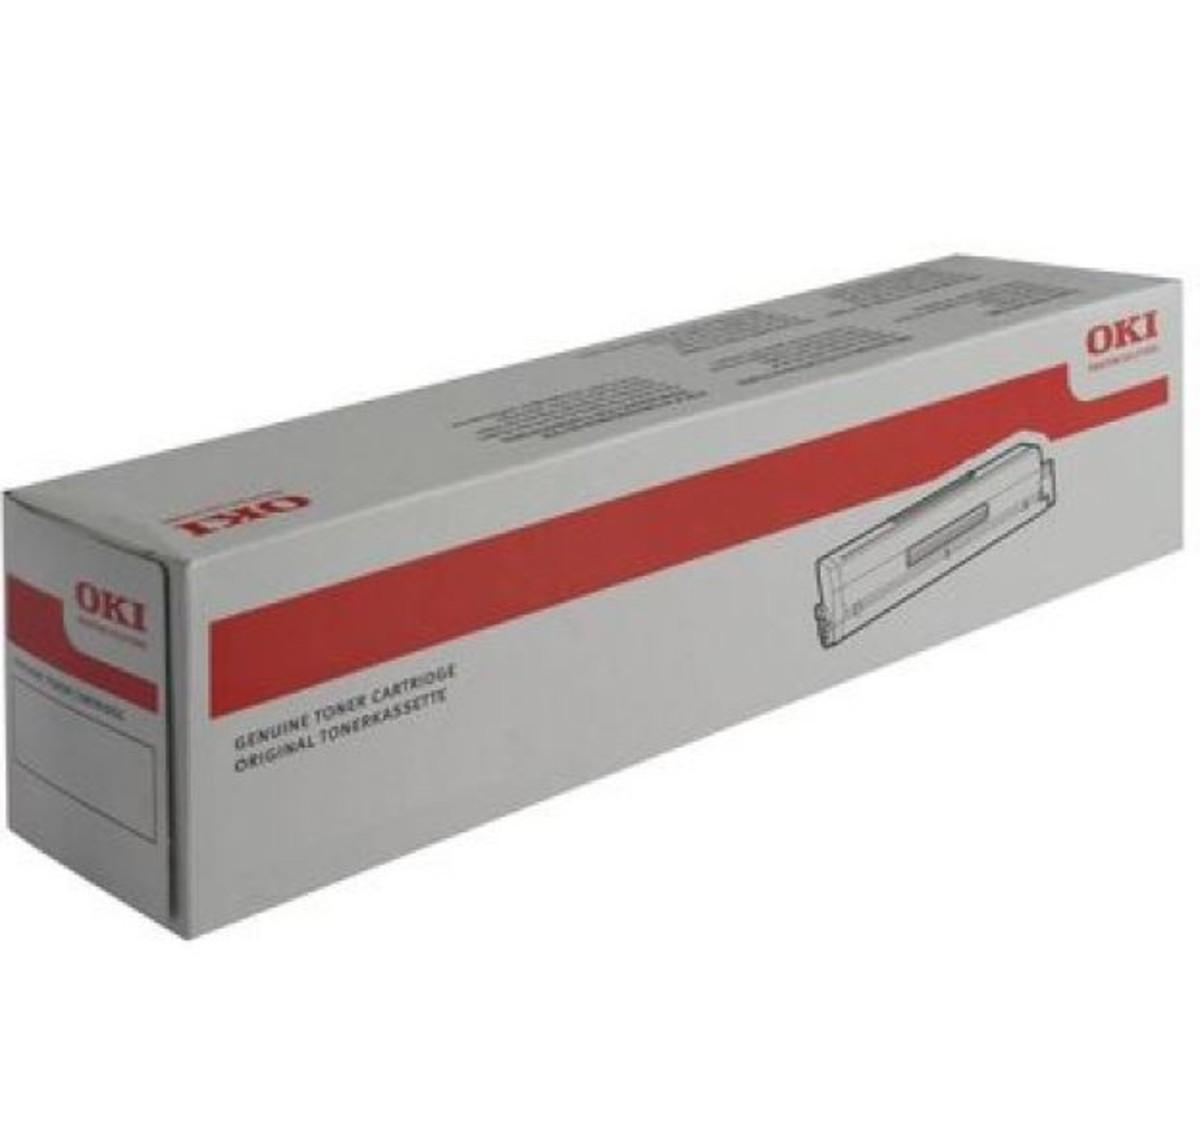 OKI 44992406 Black Toner Cartridge